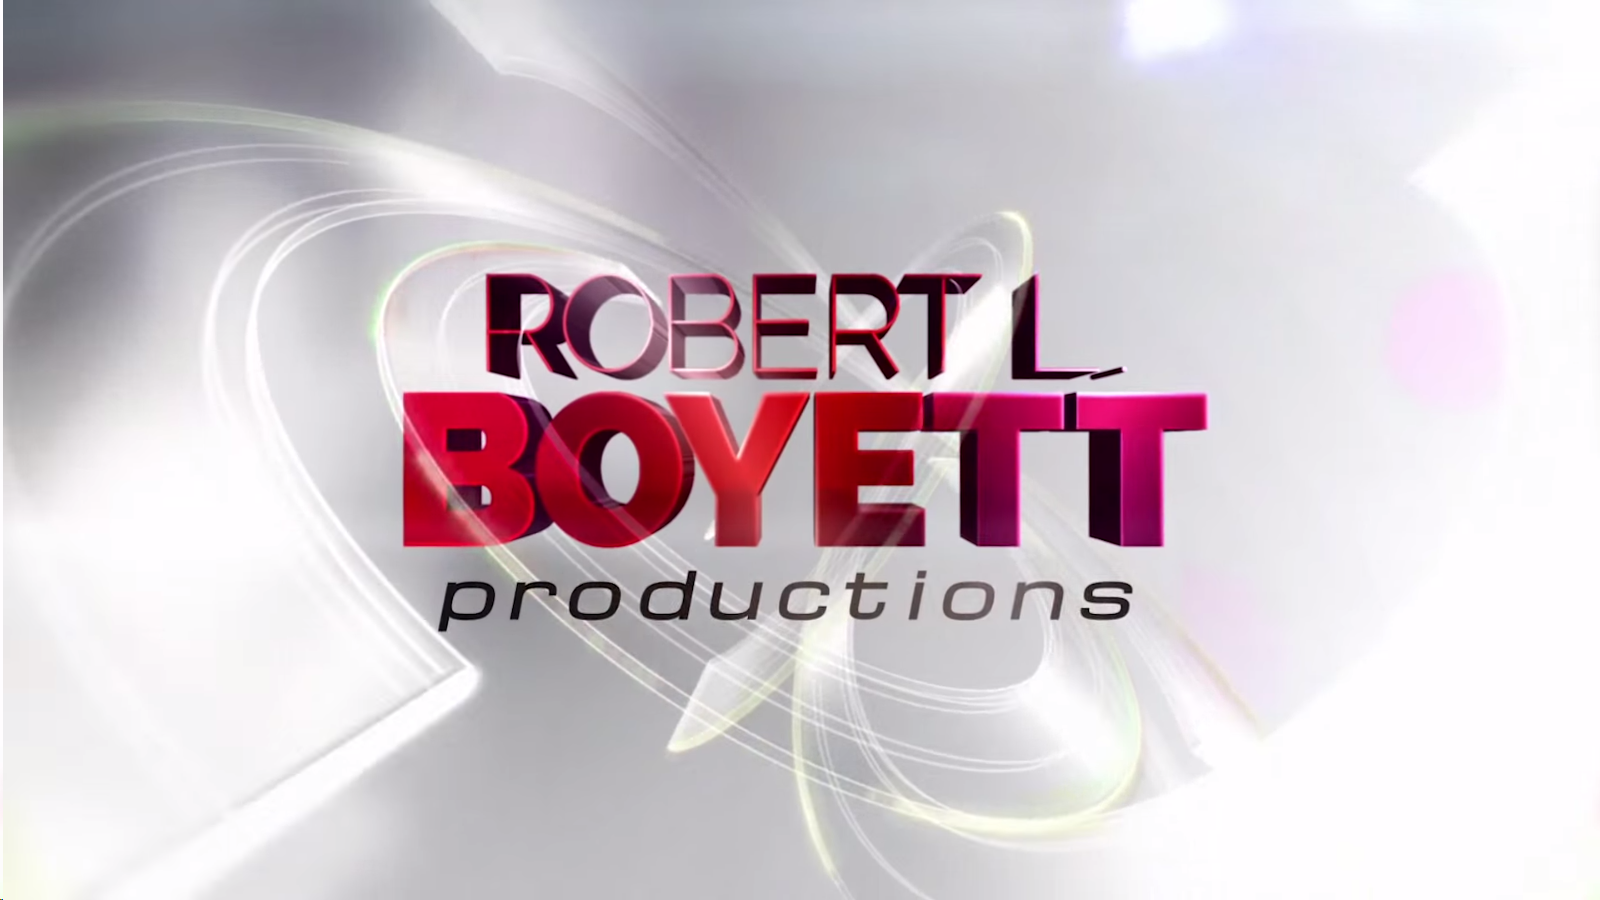 Robert L. Boyett Productions